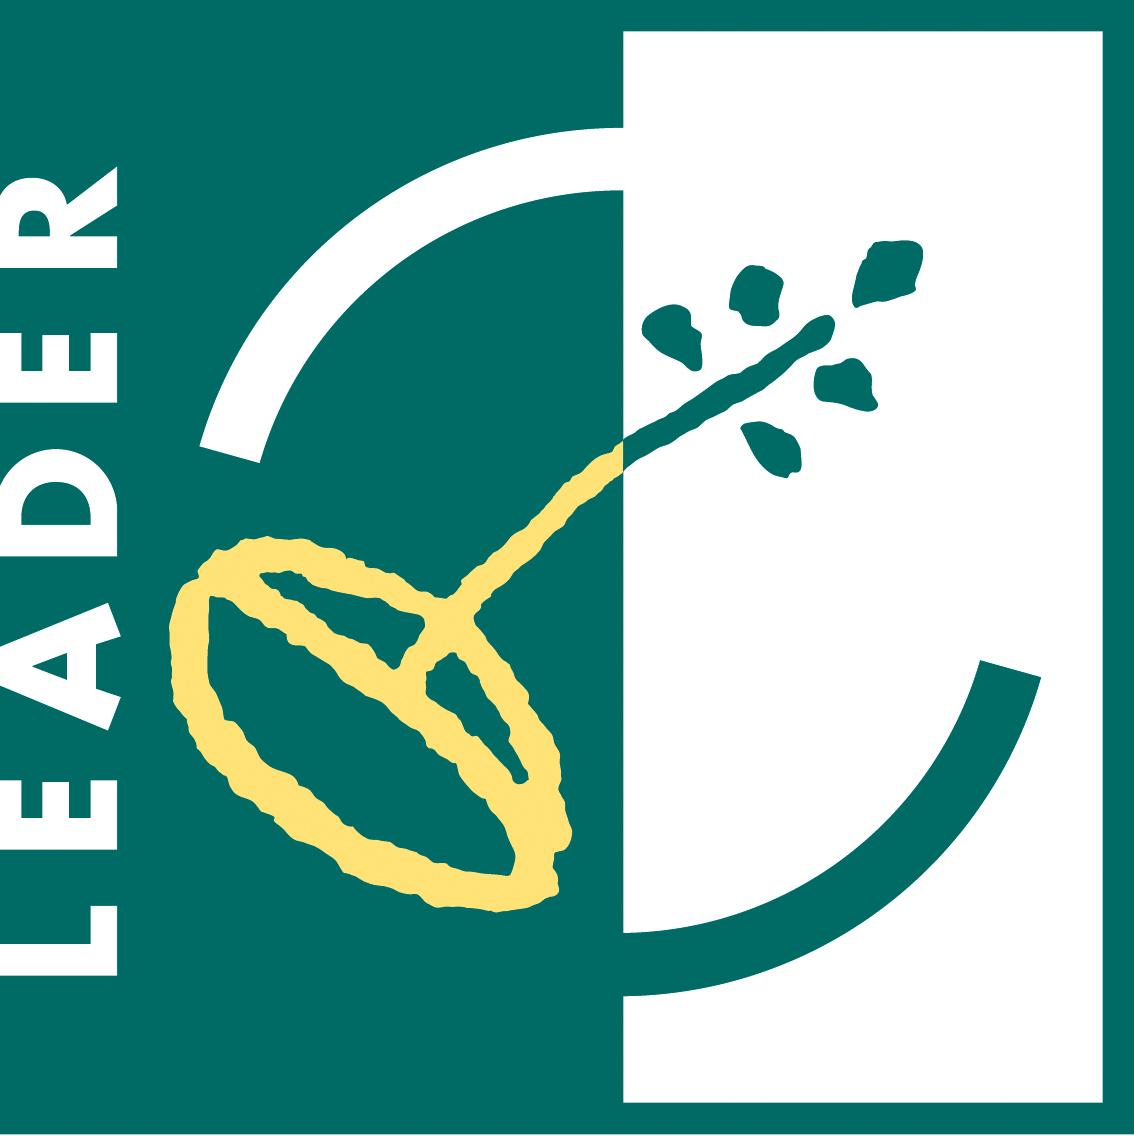 leaderLogo-high res.jpg